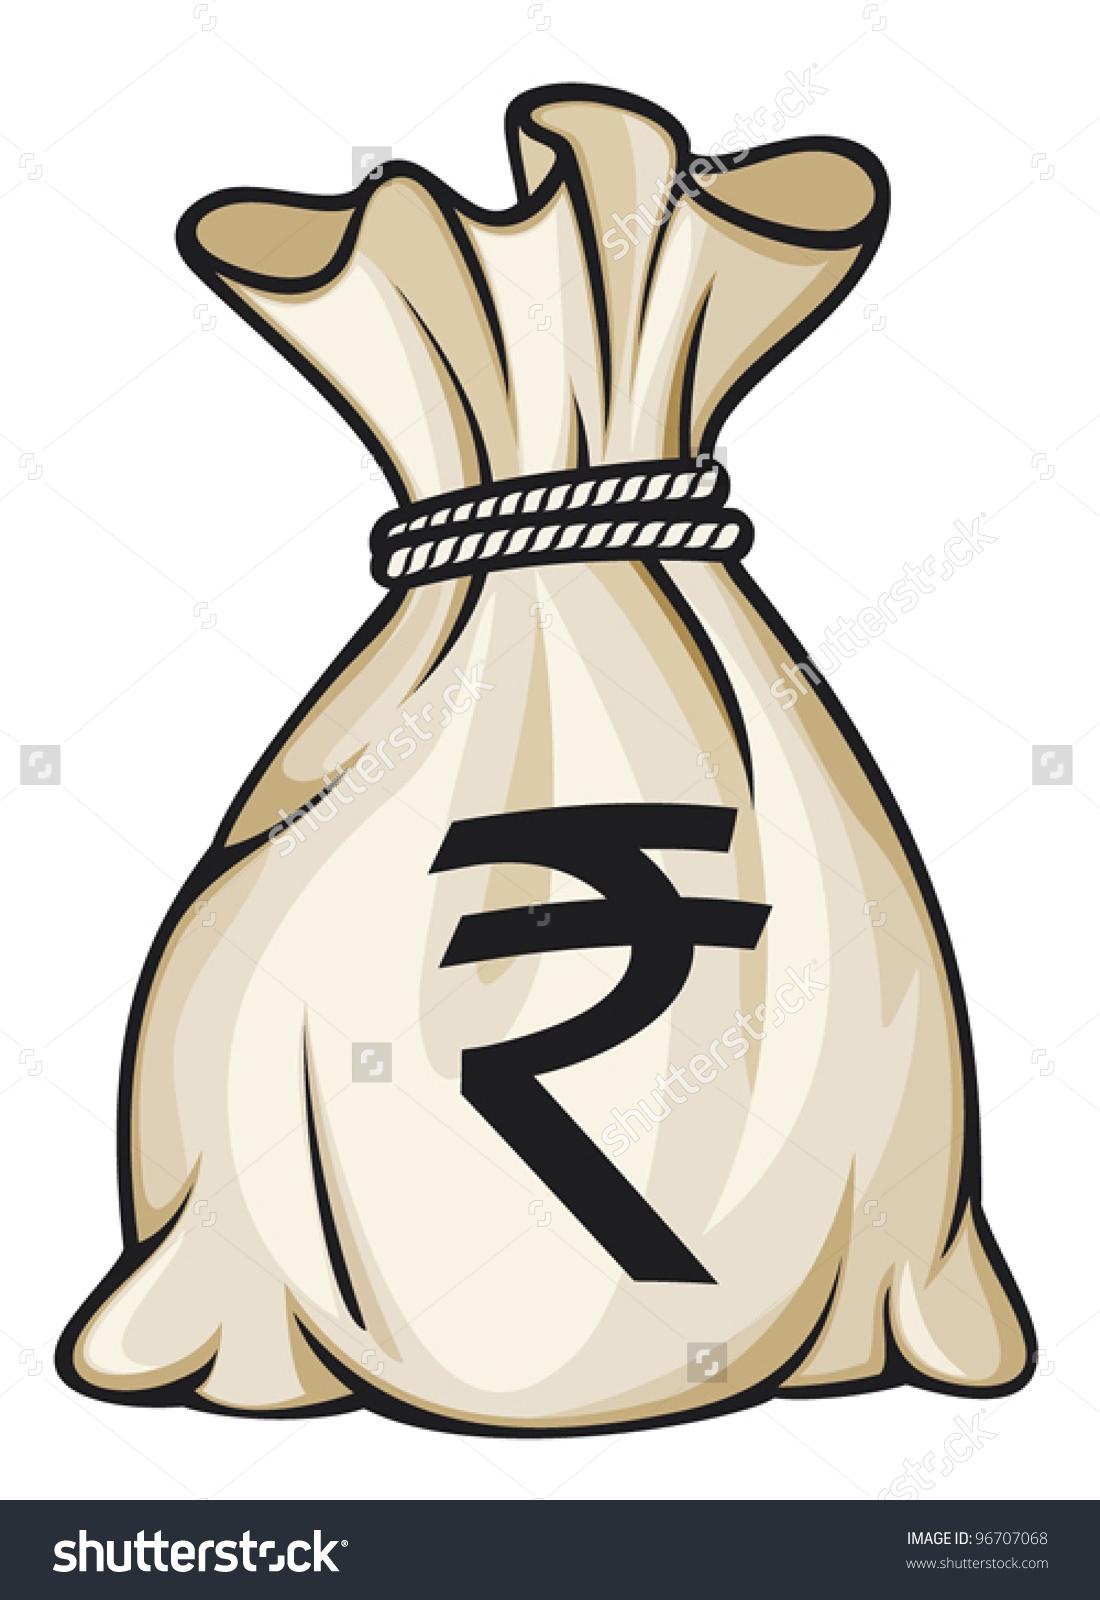 Rupee Money Bag Clipart.